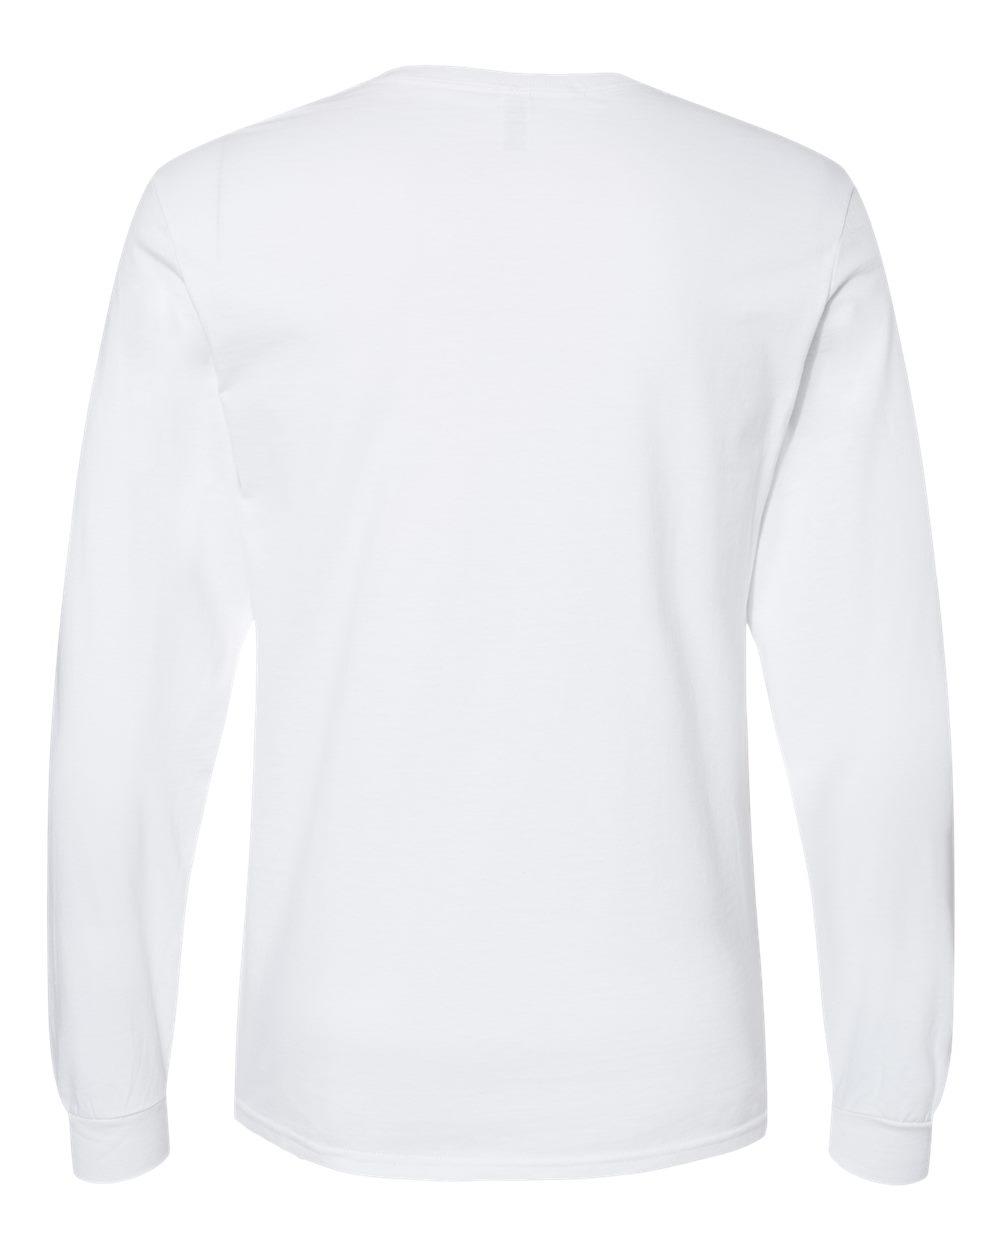 Fruit of the Loom IC47LSR - Unisex Iconic Long Sleeve T-Shirt